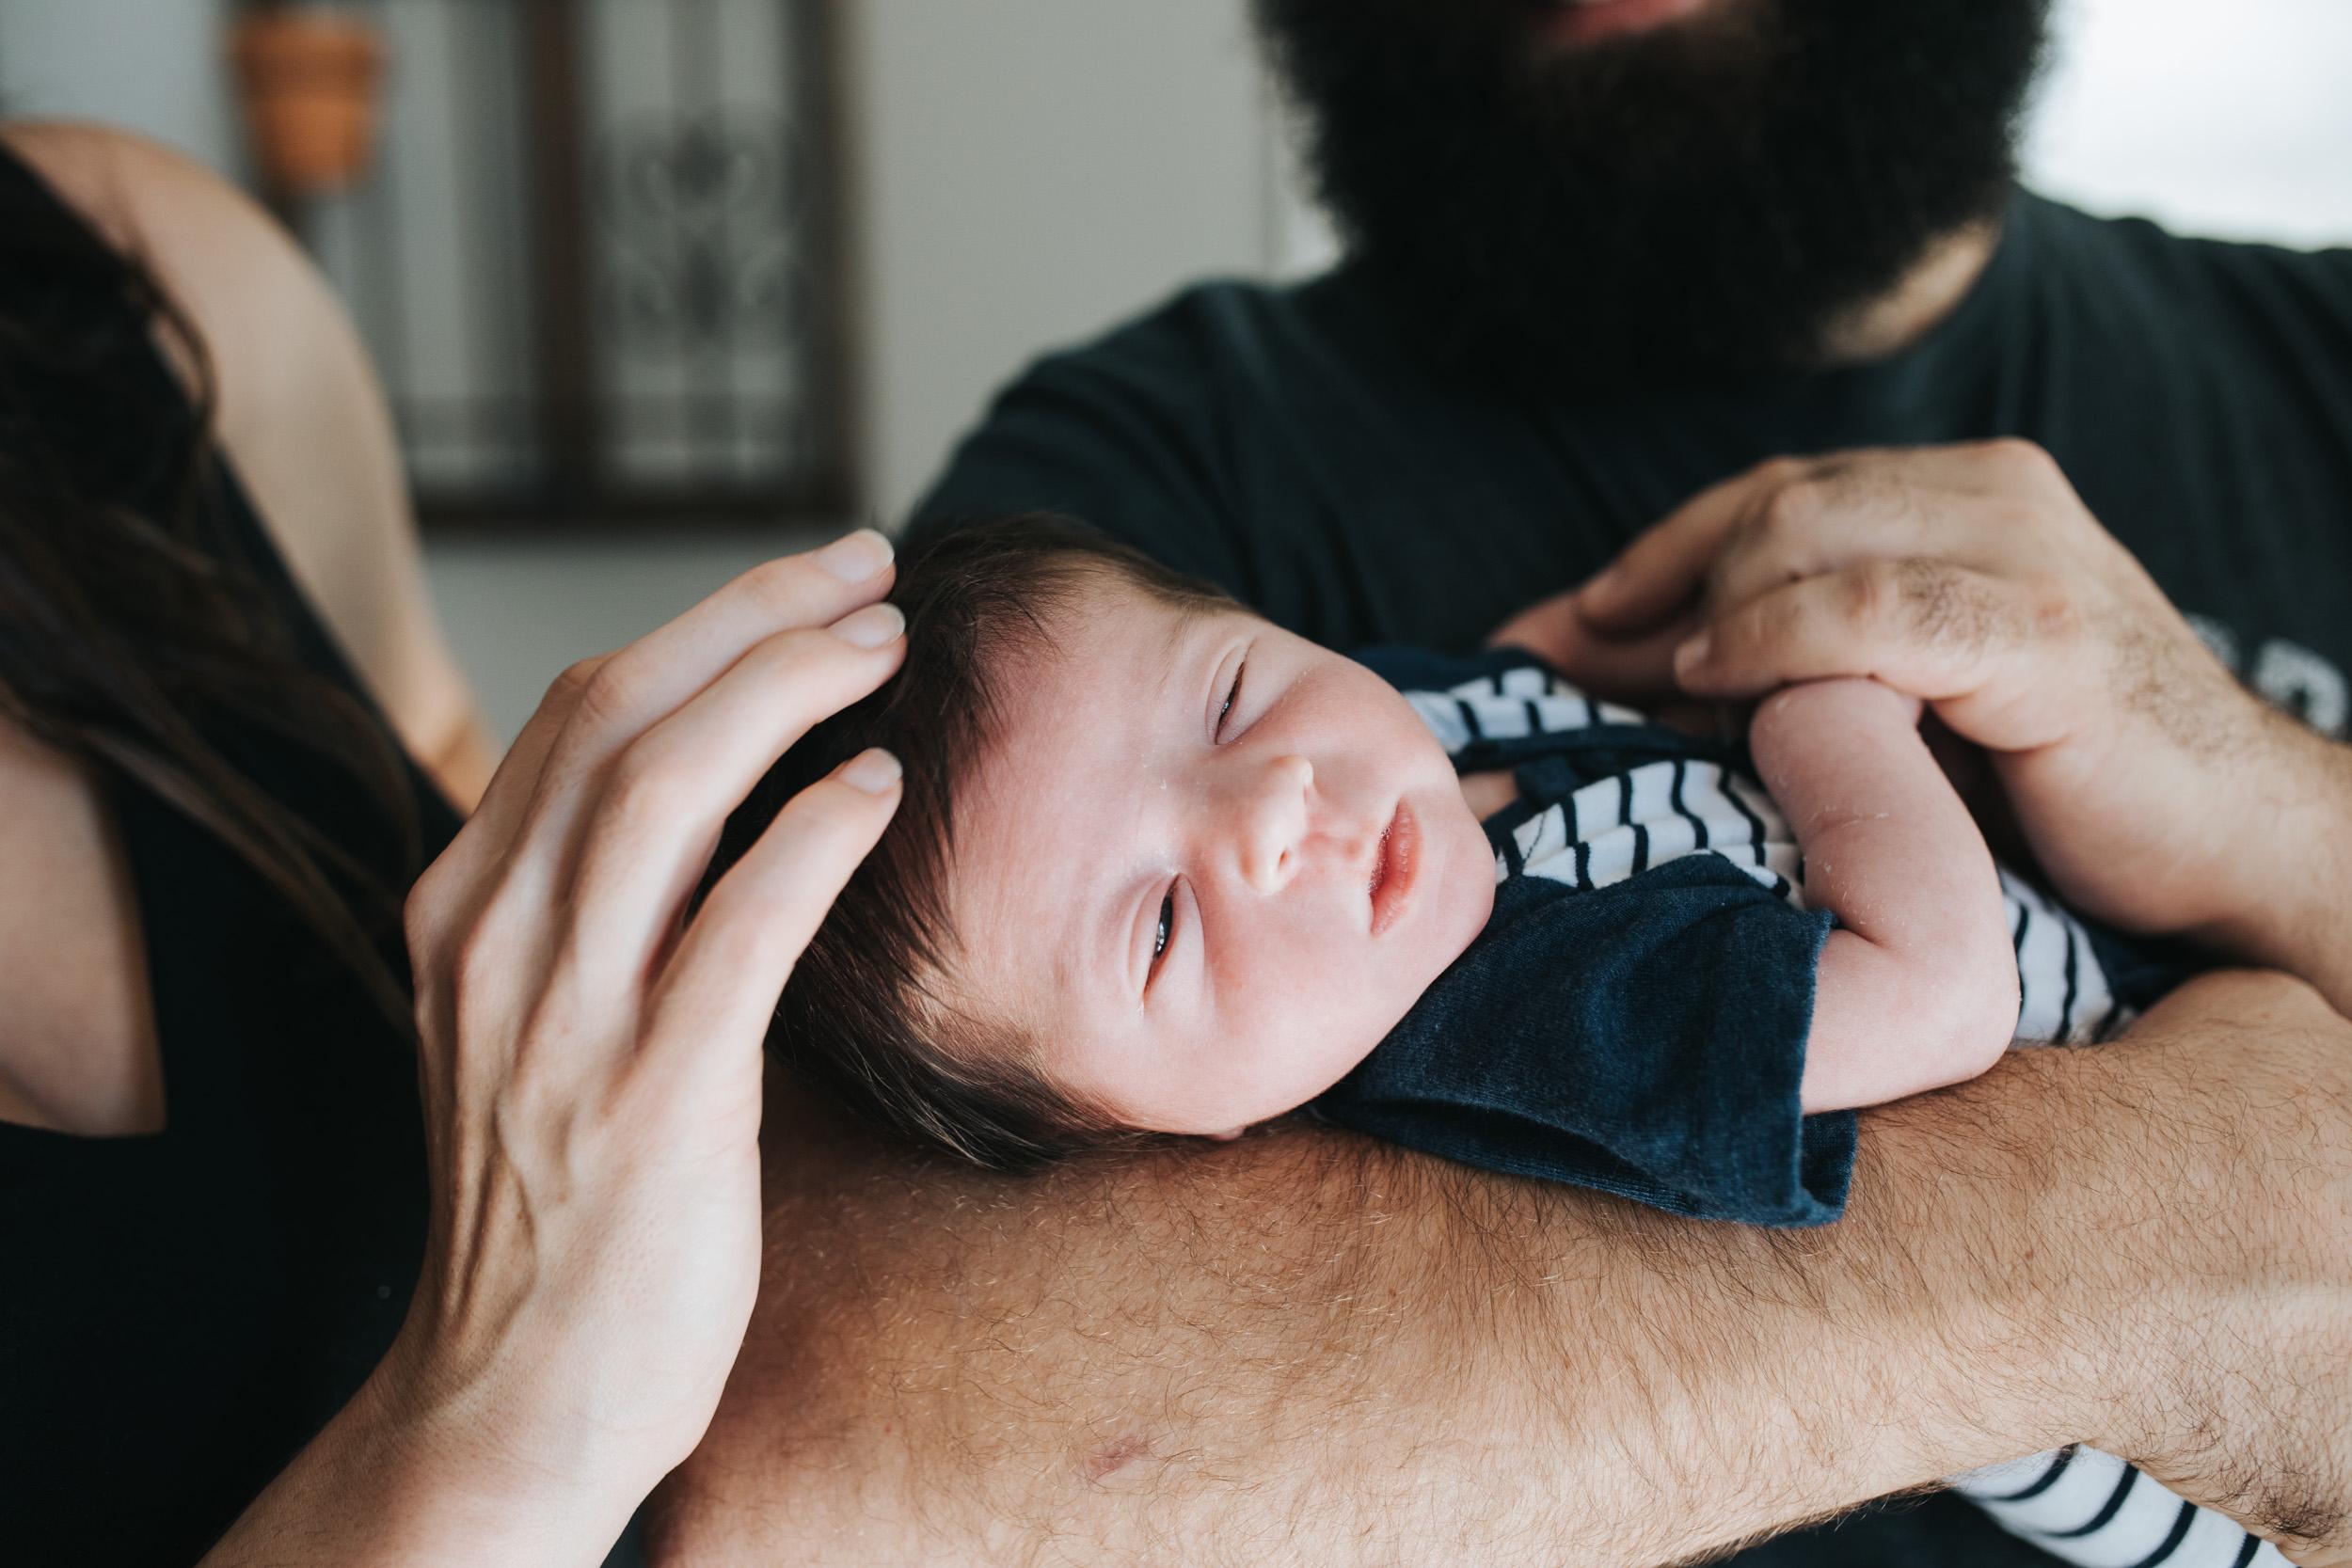 StephenPaynePhotography_BabyTaylor-13.jpg